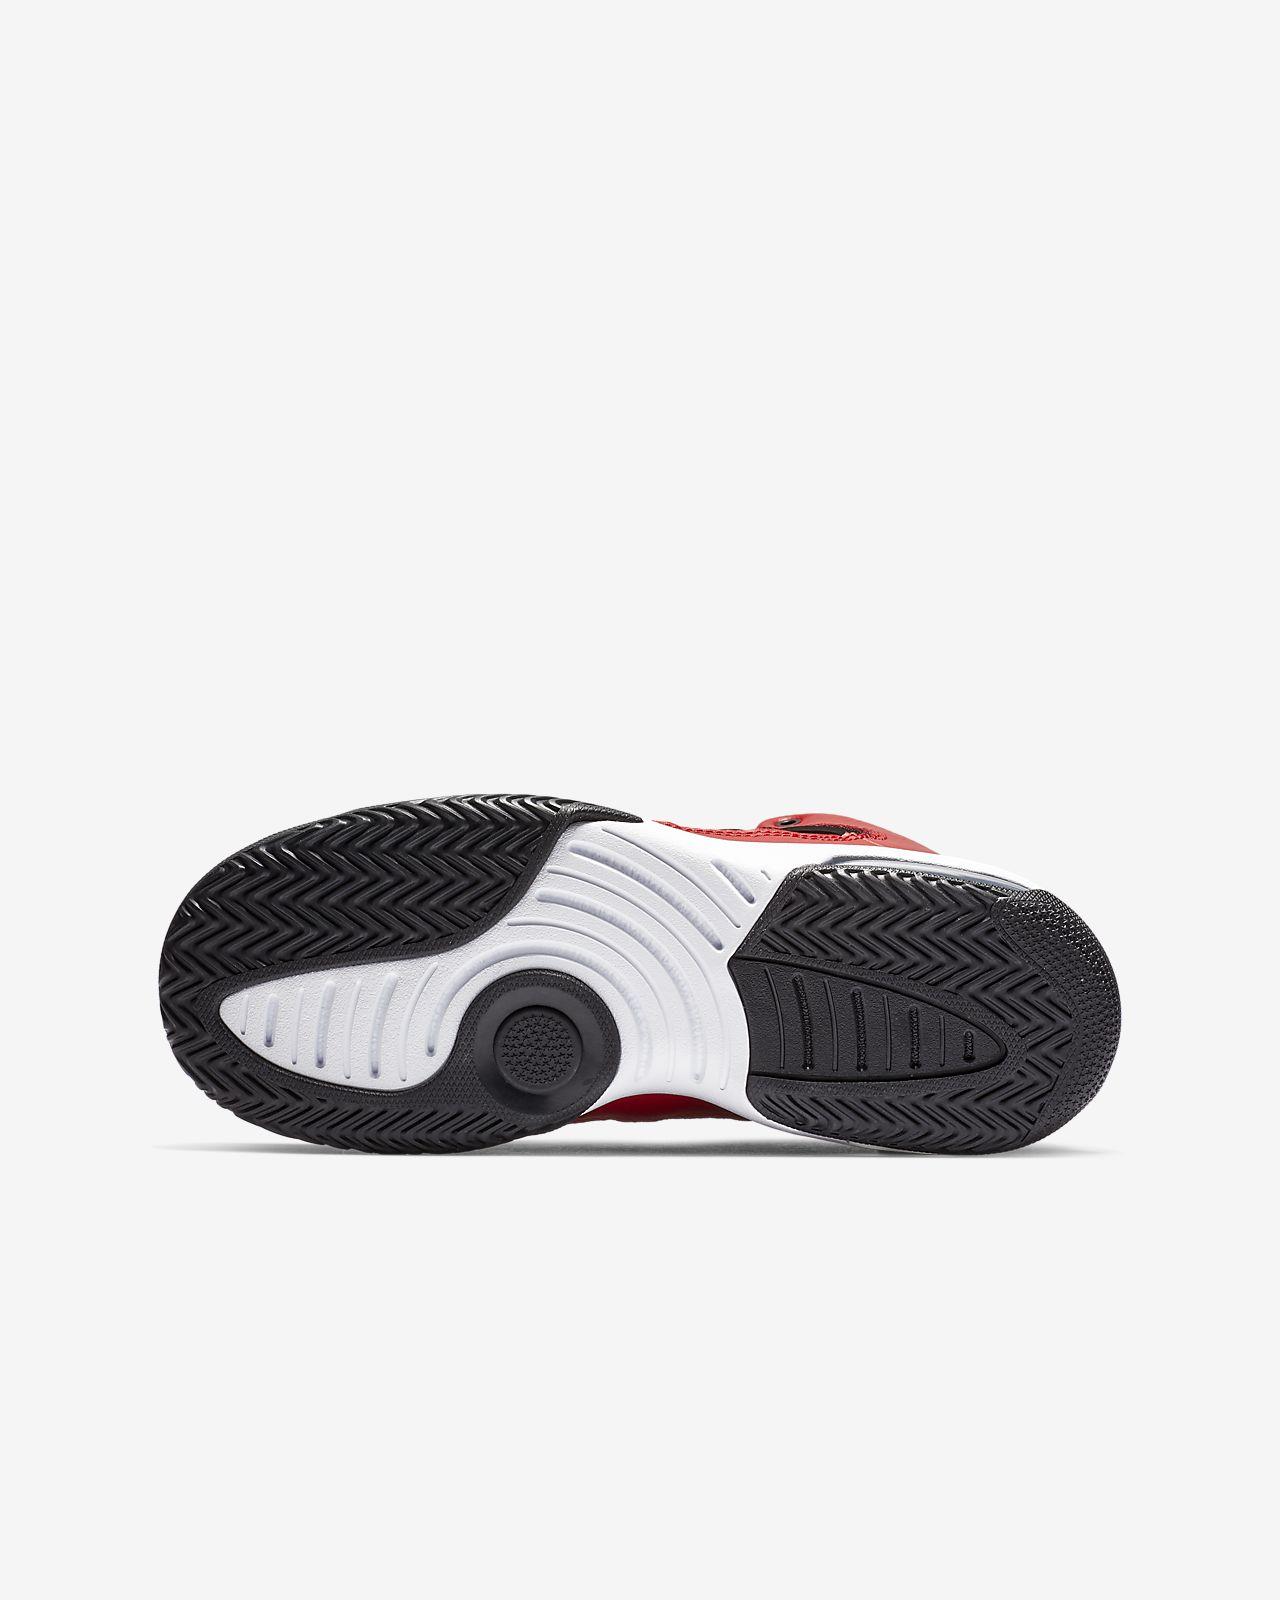 c21f22bf09a58d Jordan Max Aura Older Kids  Shoe. Nike.com GB